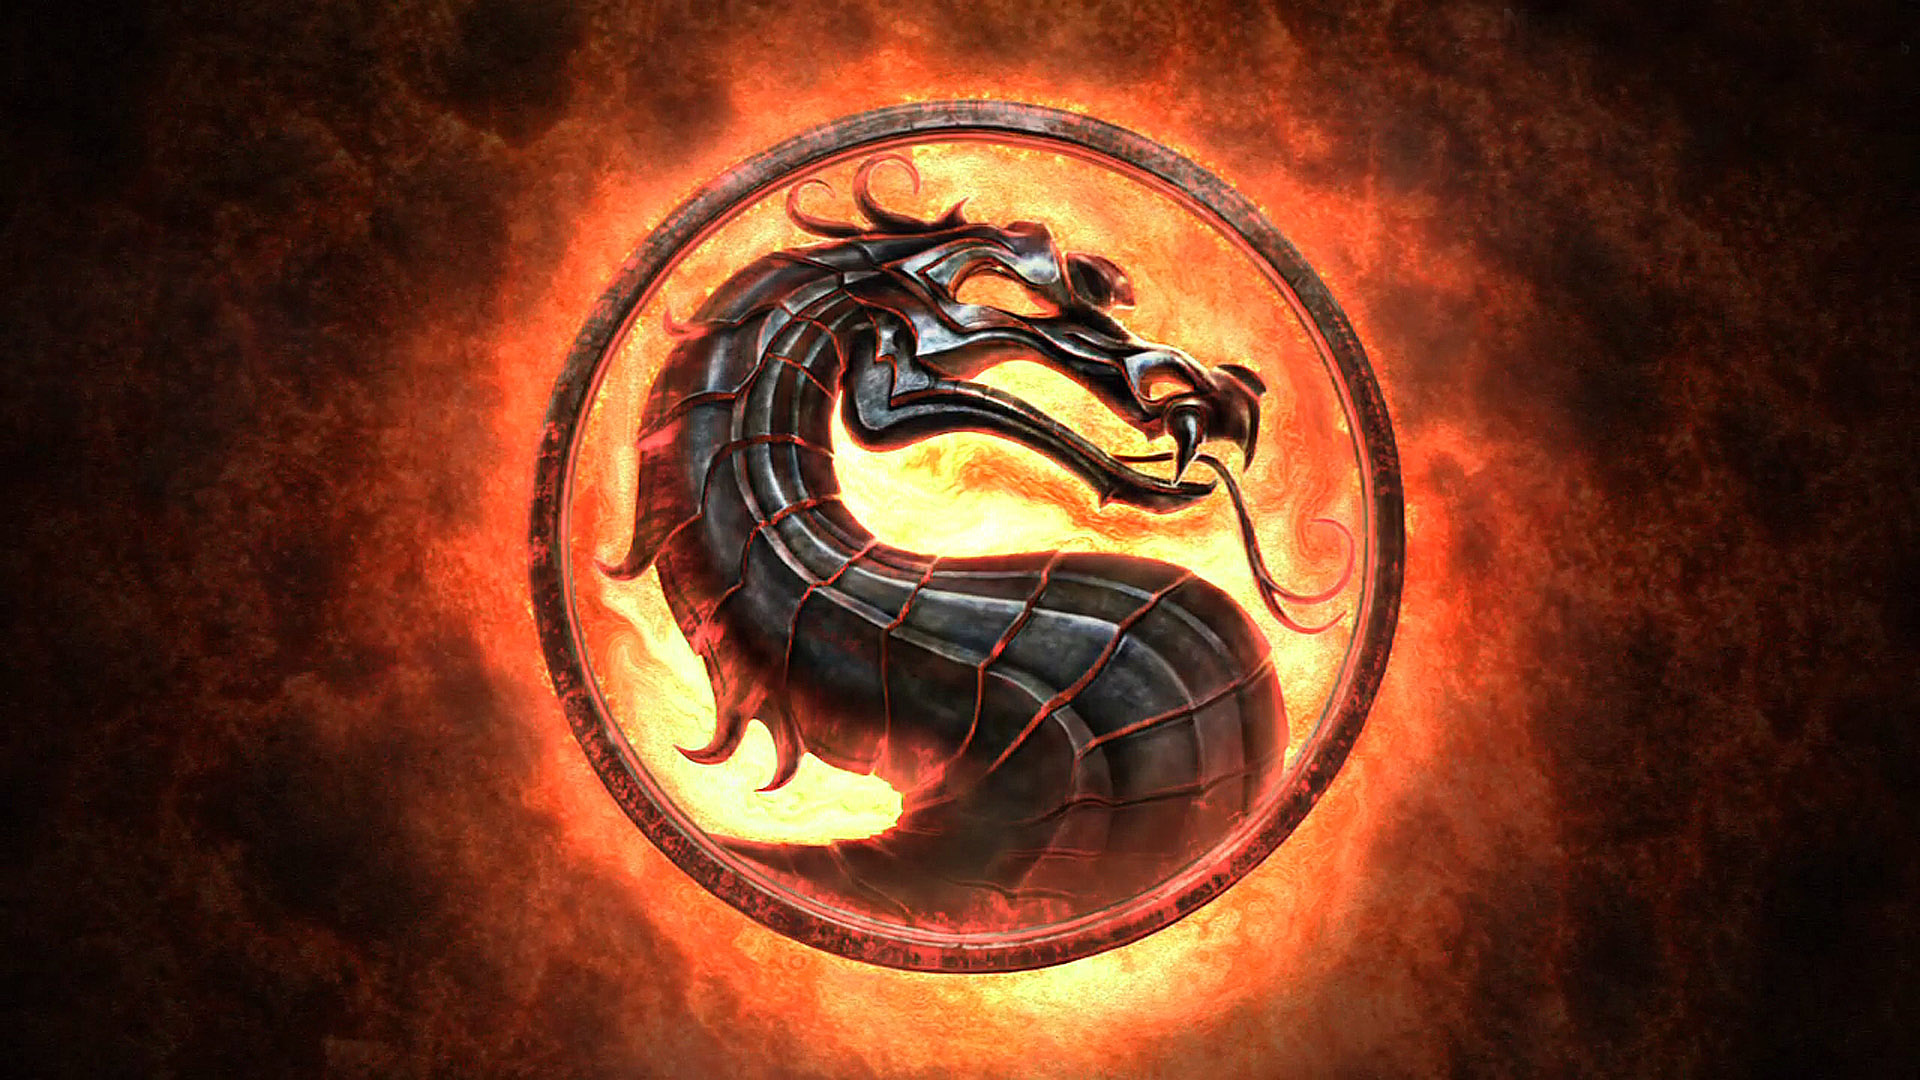 VentureBeat's Jeff Grubb said that he had heard that next was coming. Mortal Kombat 12 is a Netherrealm Studios video